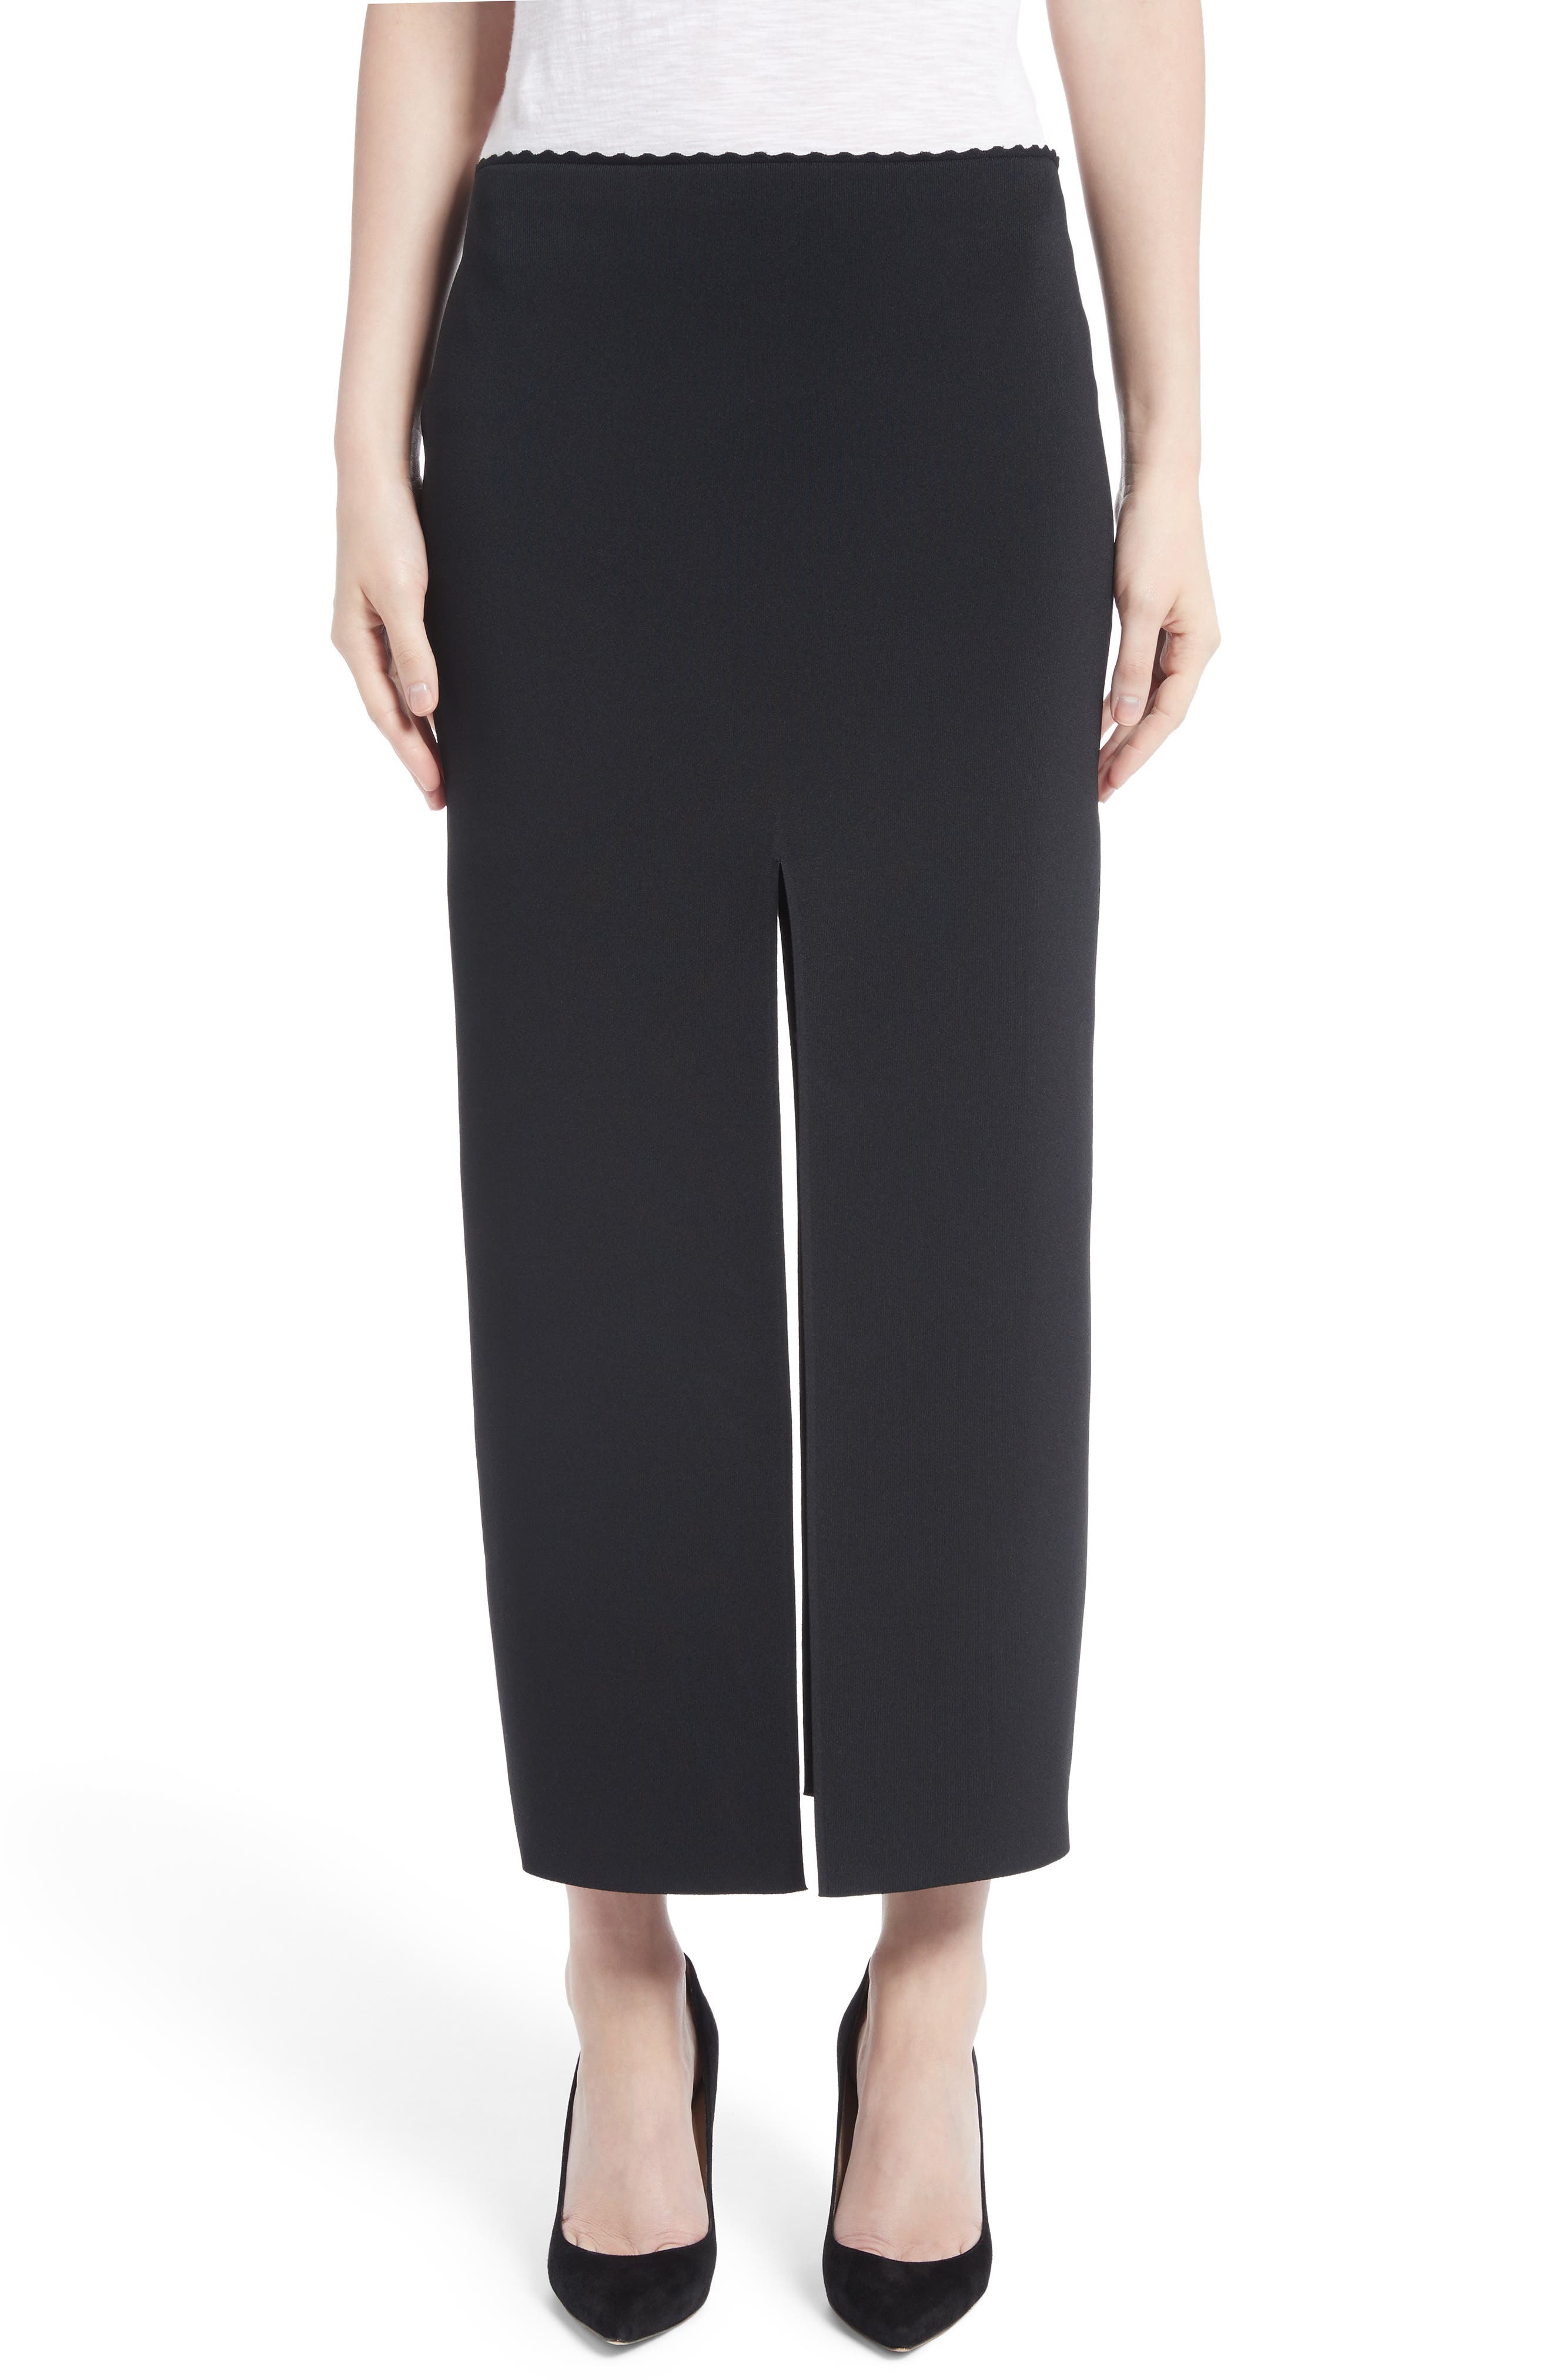 Main Image - Proenza Schouler Knit Pencil Skirt